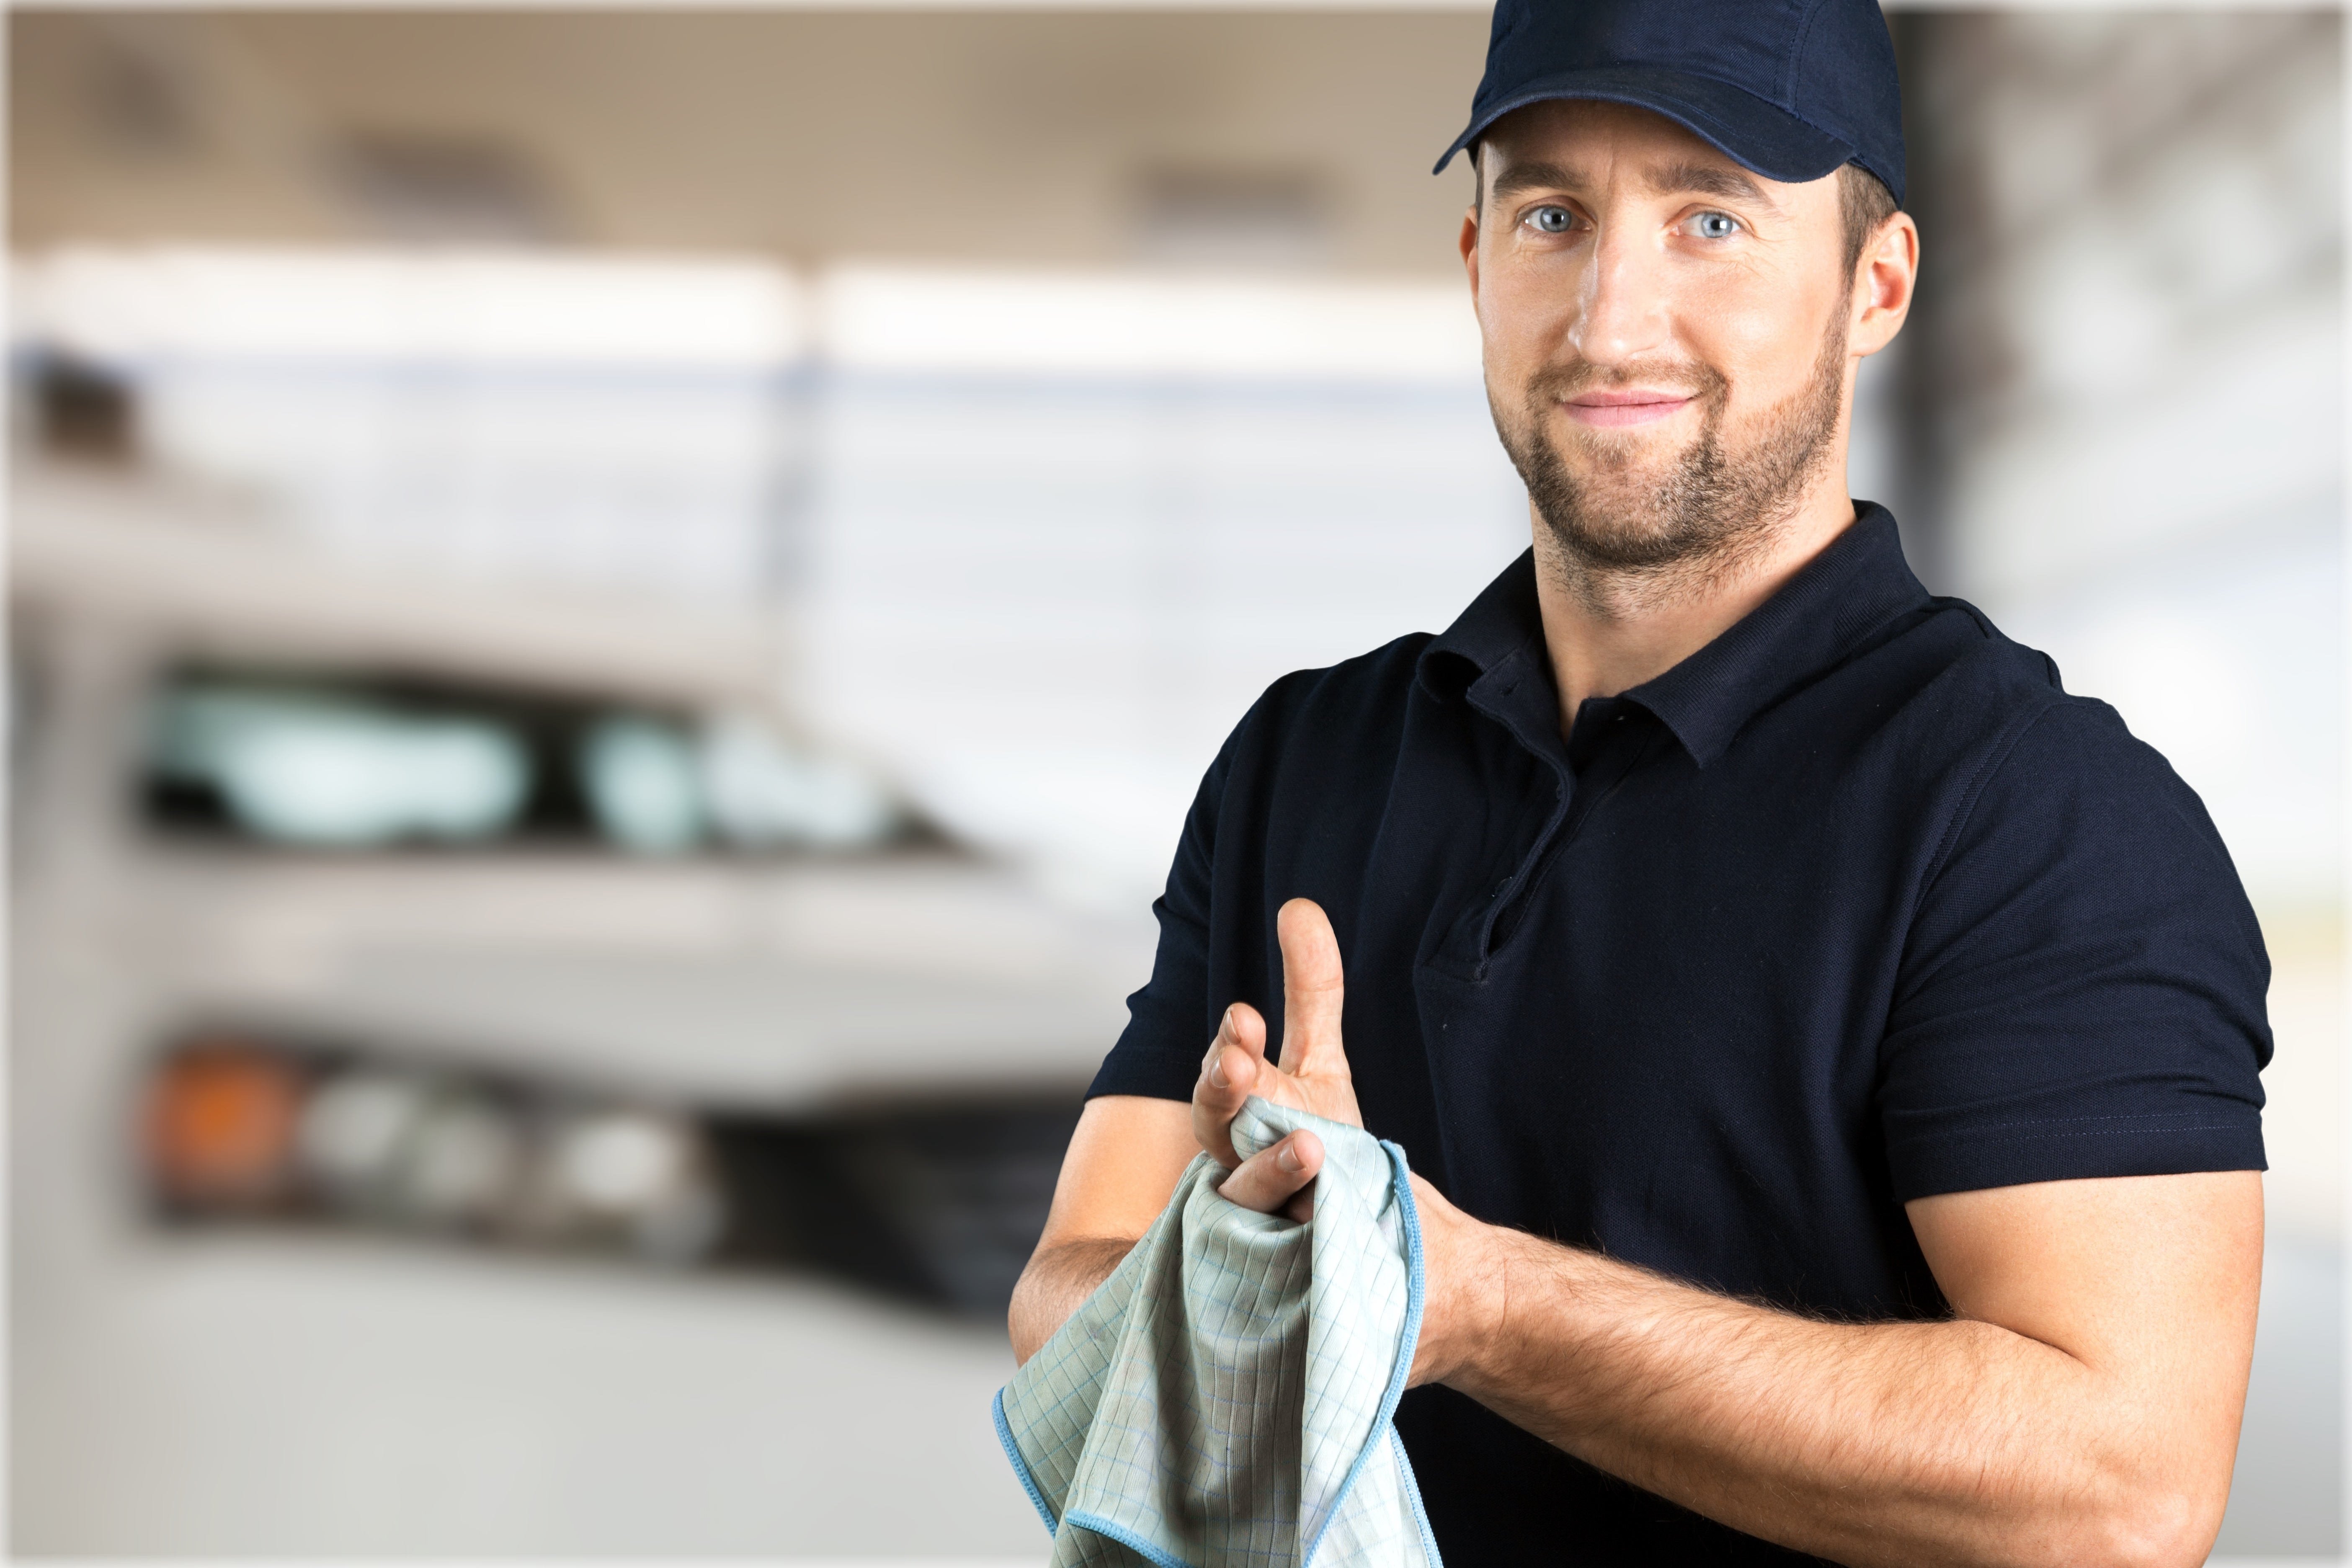 autozone employee complaints